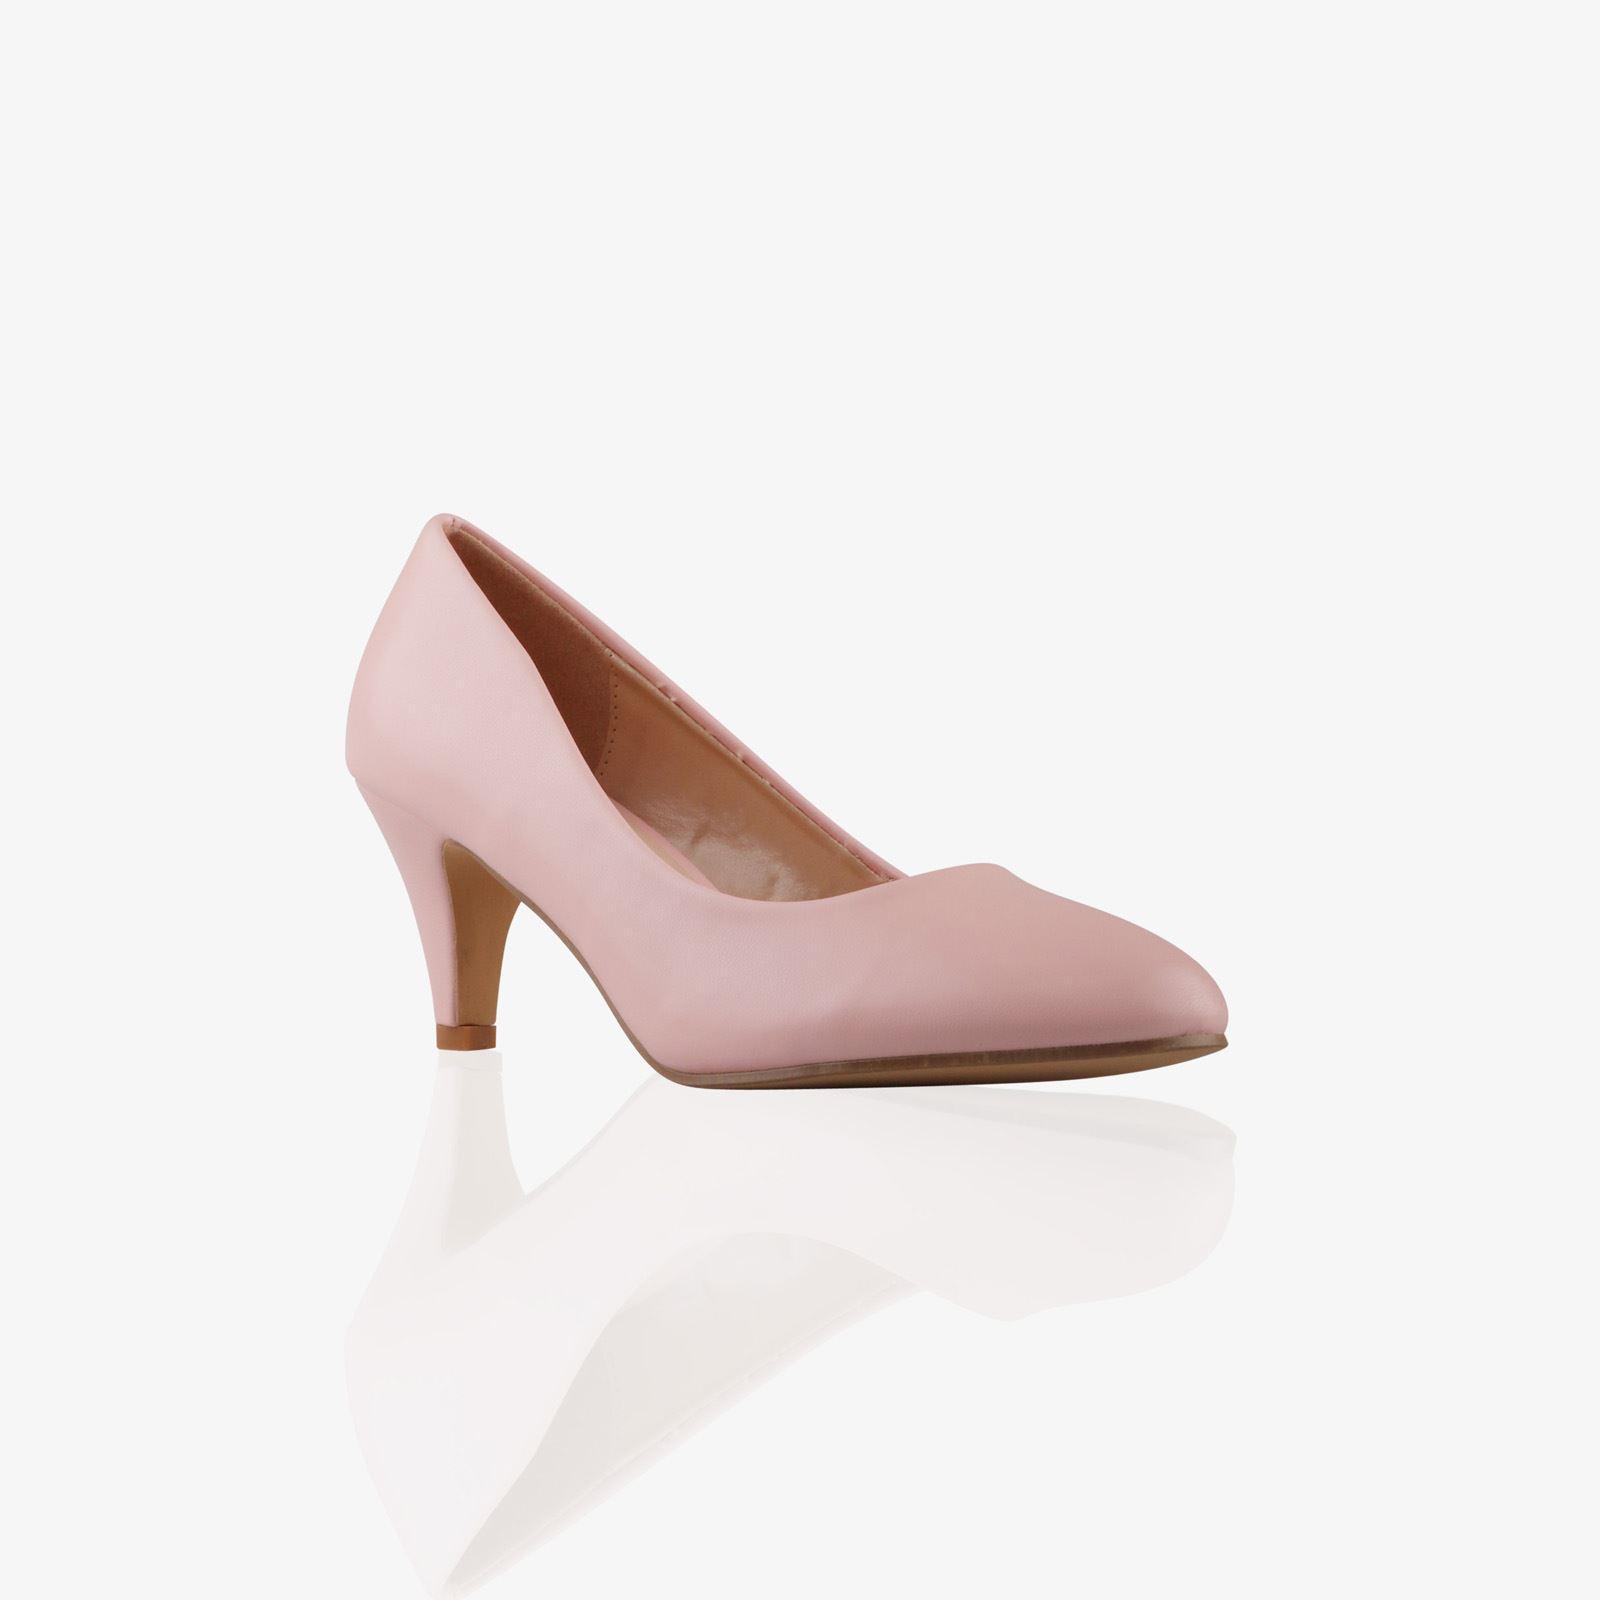 Womens-Ladies-Mid-Heel-Court-Shoes-Slip-On-Low-Kitten-Heels-Pumps-Matte-Size-3-8 thumbnail 18